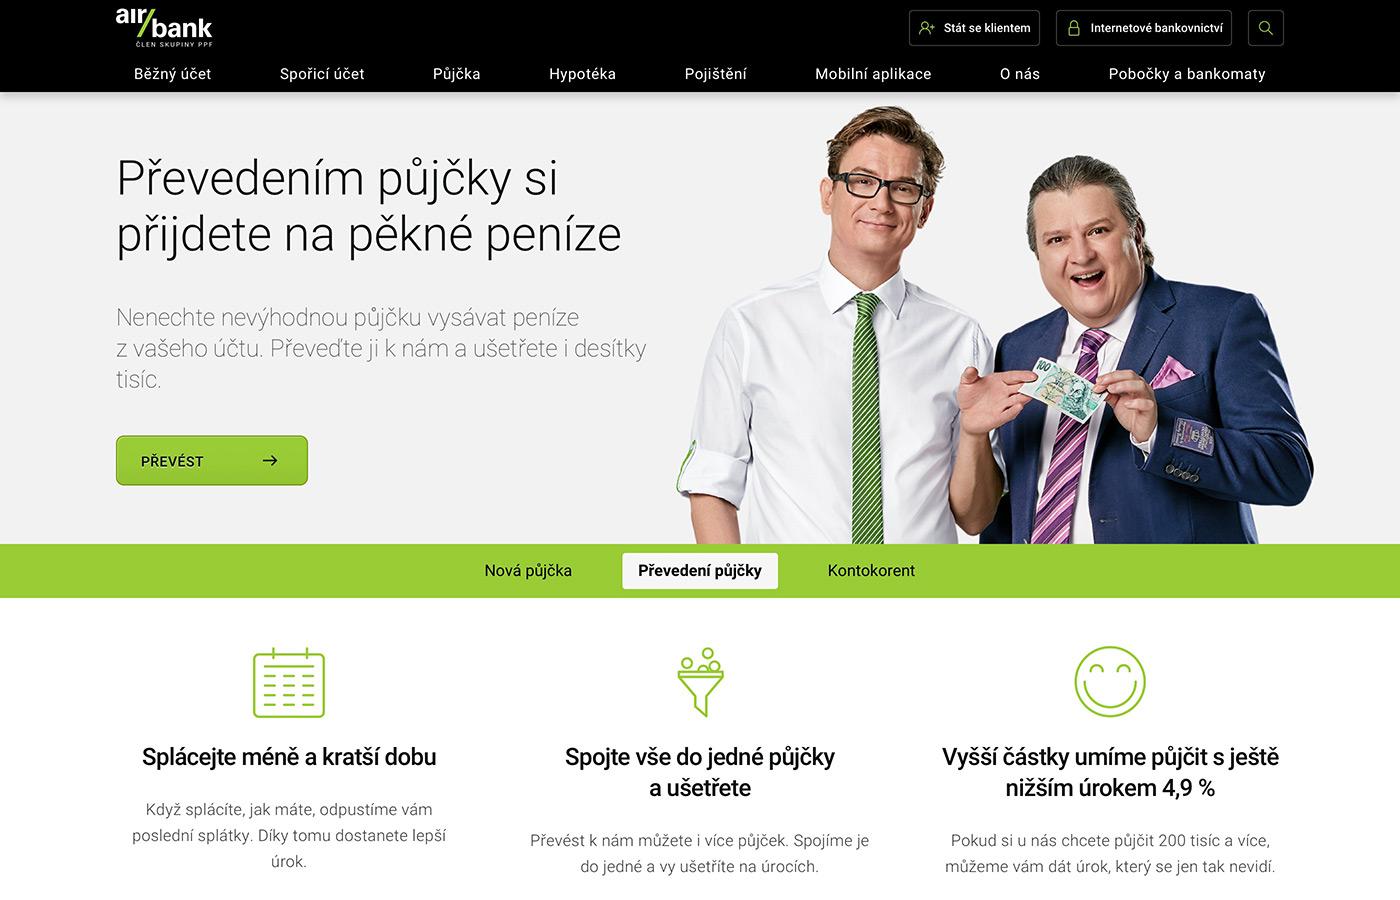 Webové stránky https://www.airbank.cz/produkty/prevedeni-pujcky/